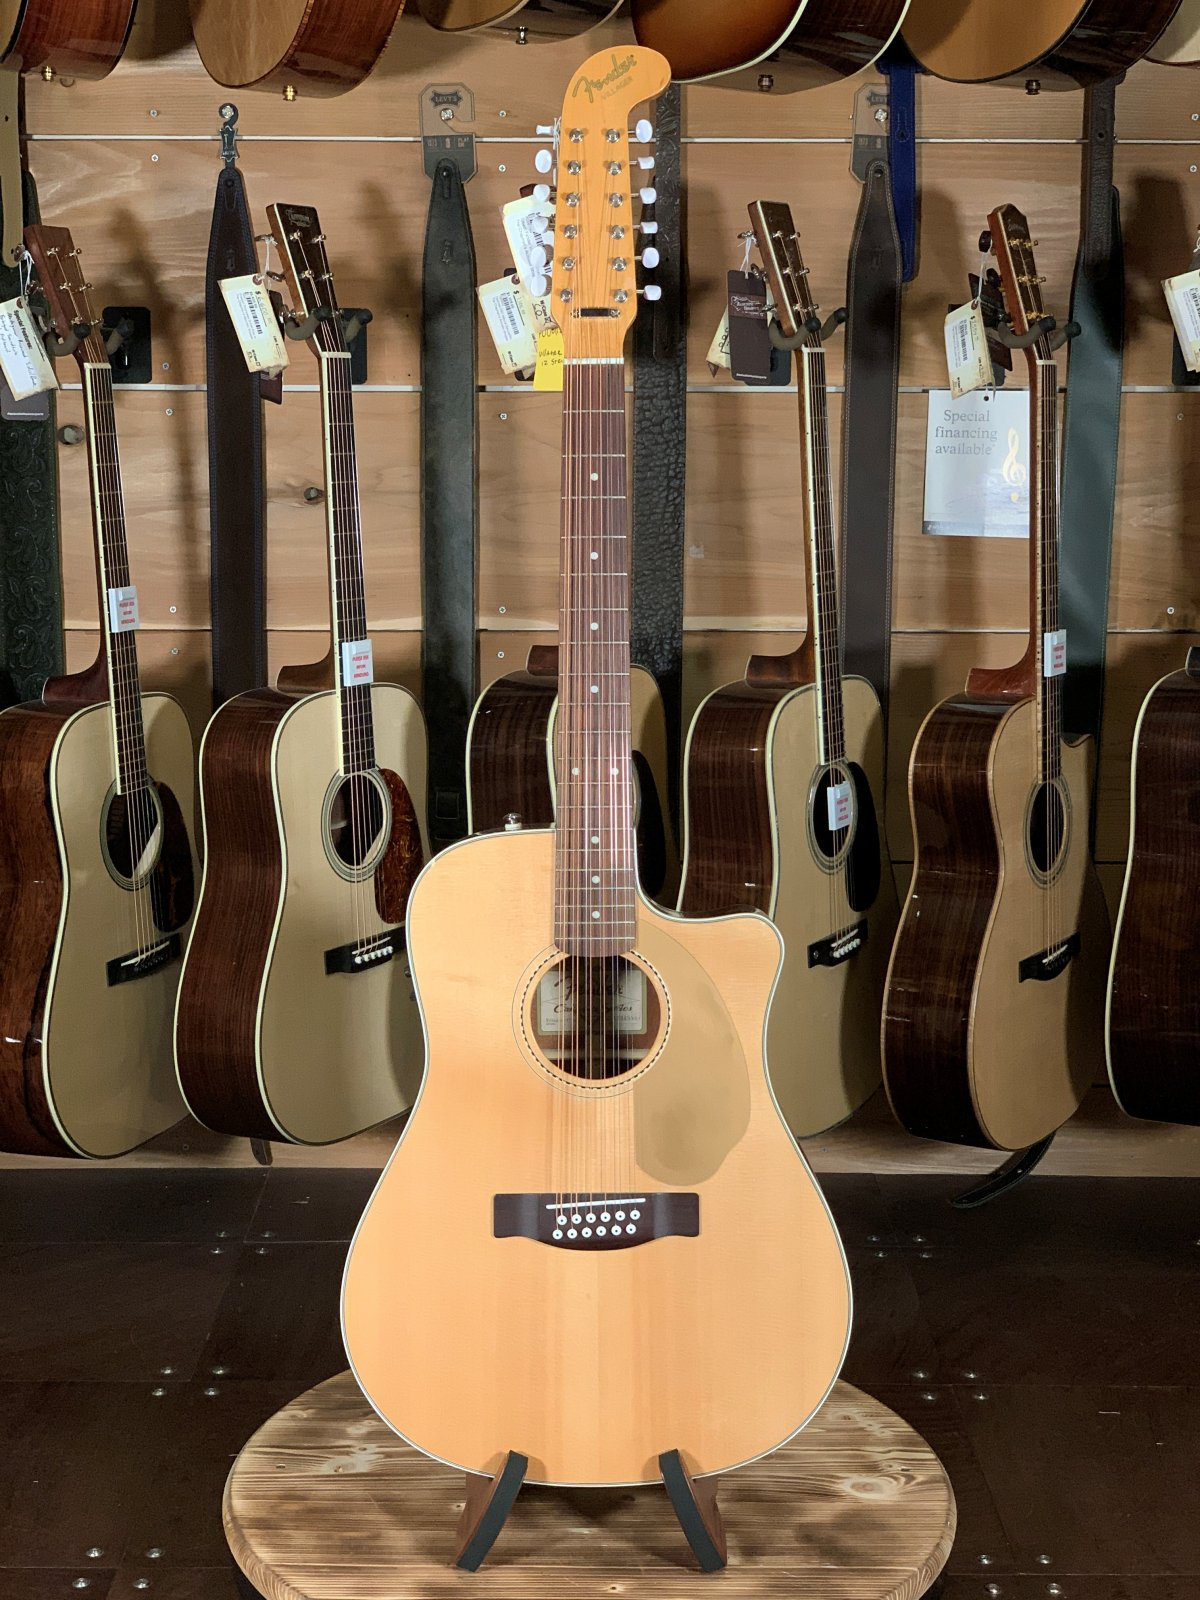 (Used) Fender Villager California Series 12 String Acoustic Guitar #5557